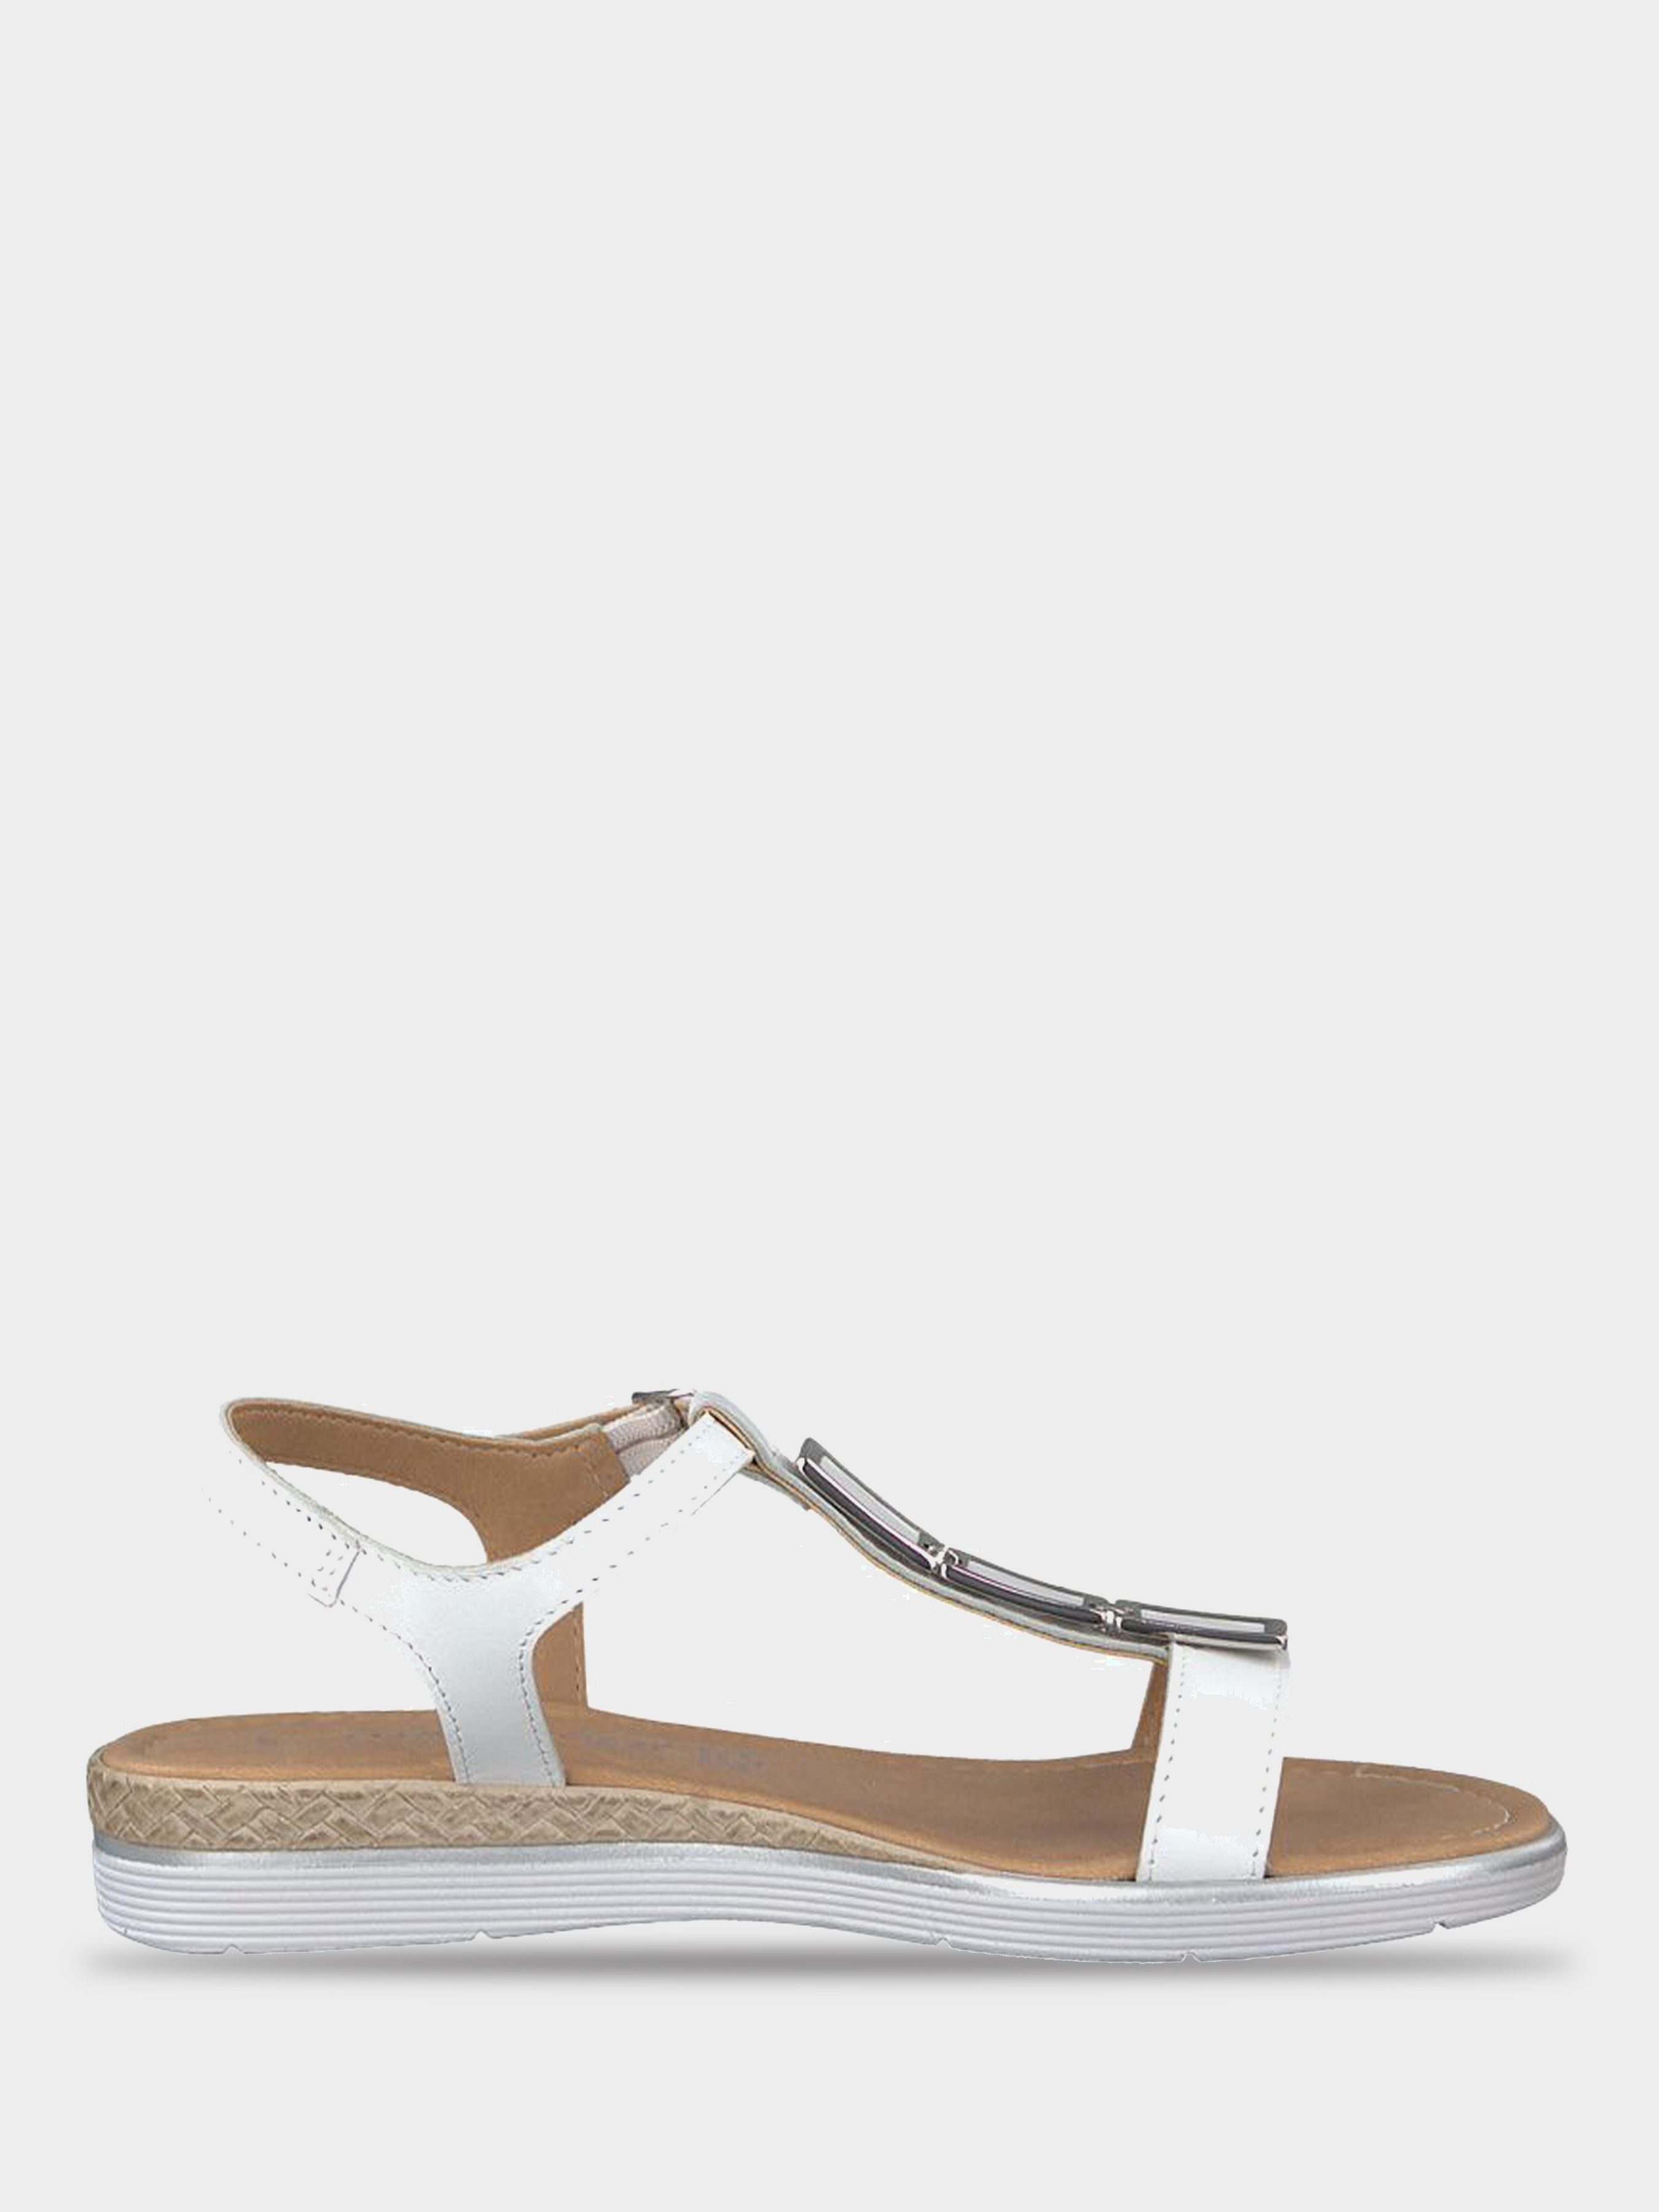 Сандалии женские Marco Tozzi 3H60 размерная сетка обуви, 2017